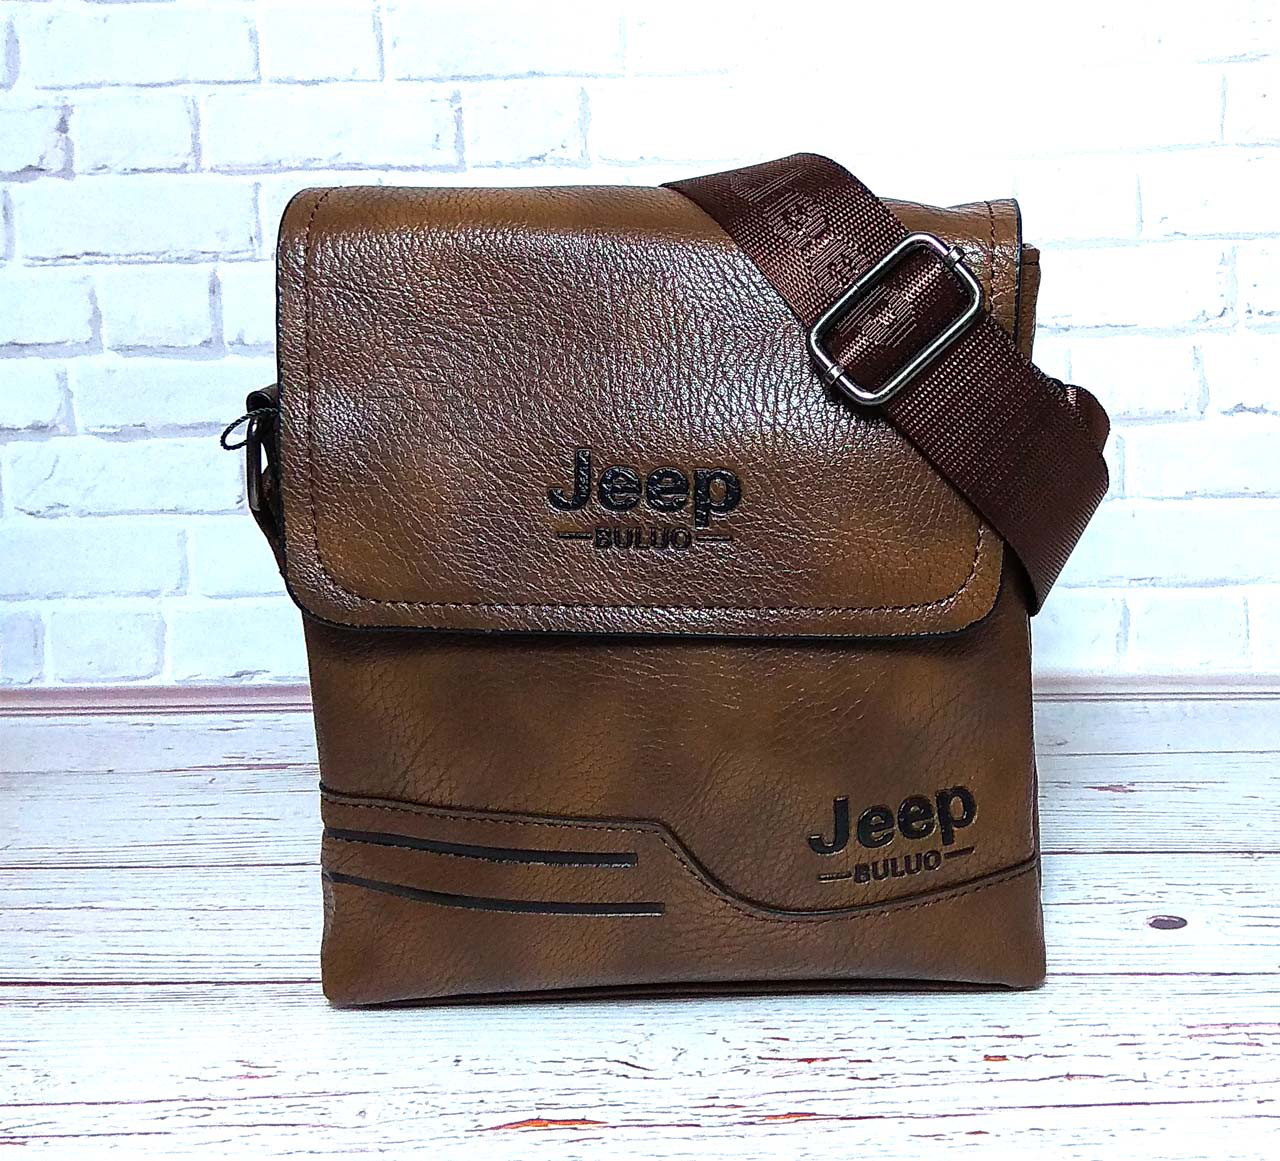 Мужская сумка через плечо Jeep. Коричневая. 21см х 19см / Кожа PU. 557 brown